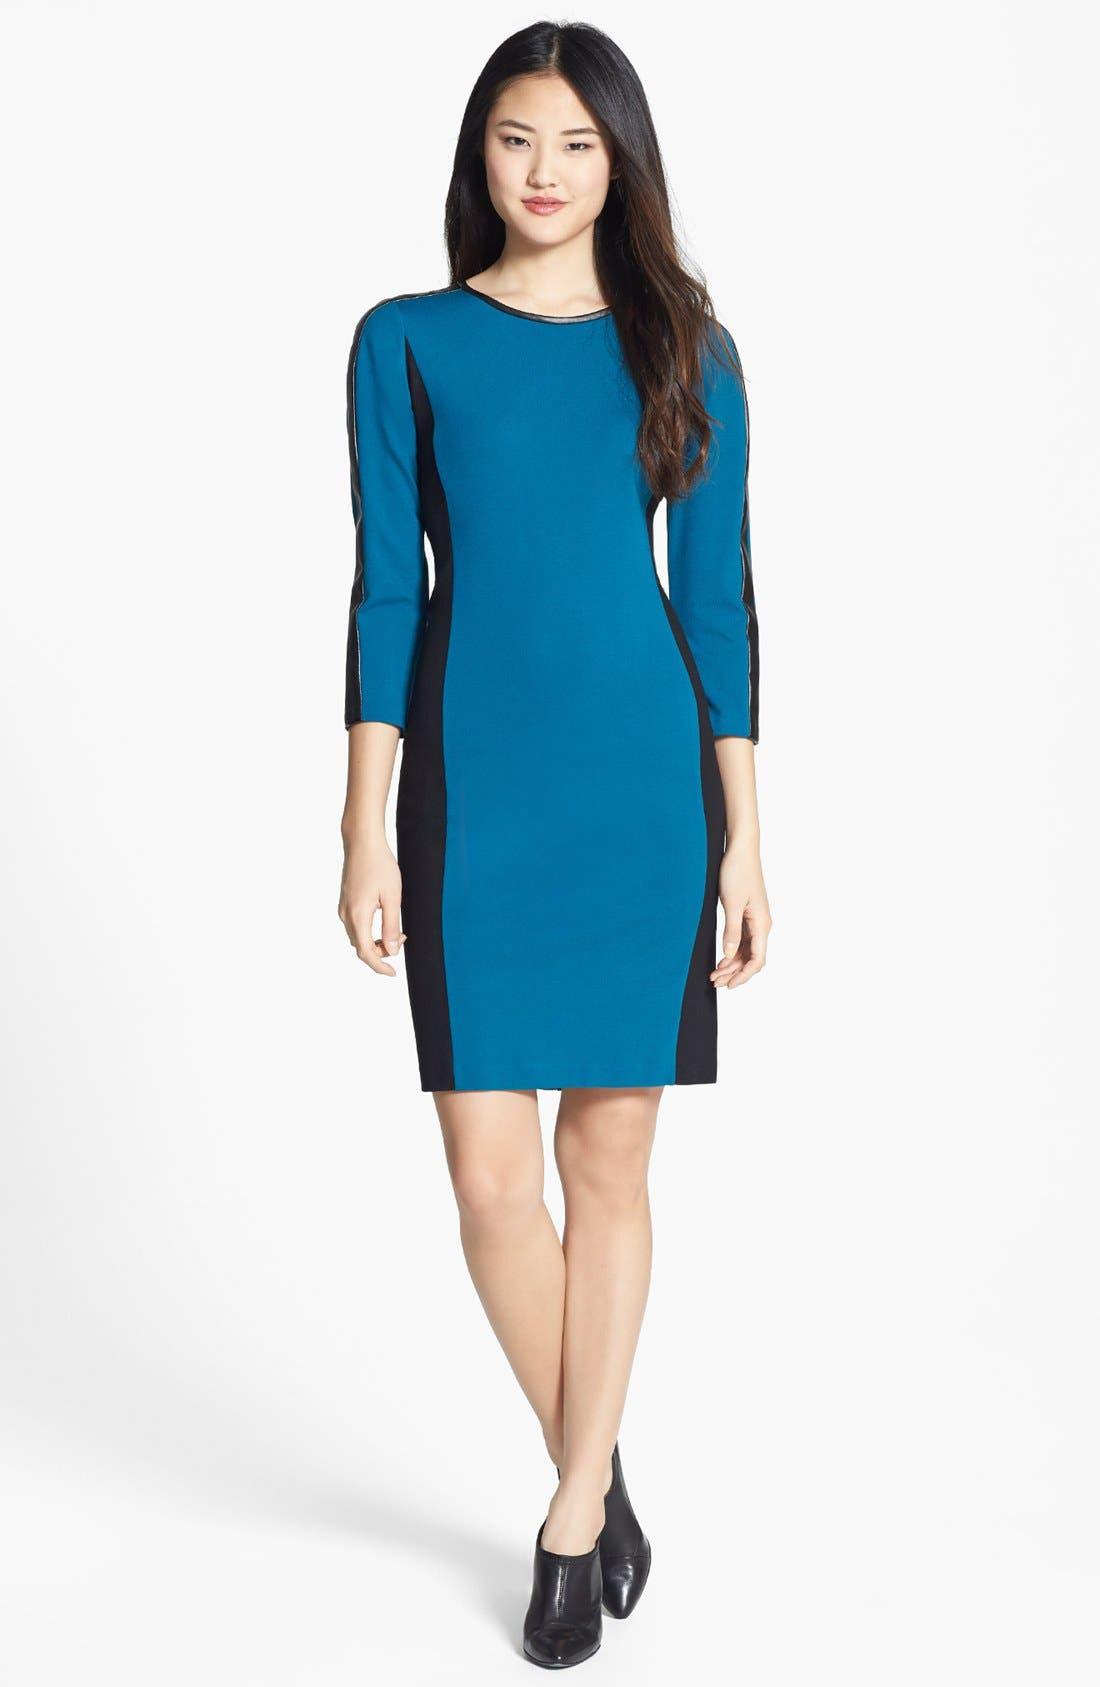 Main Image - DKNYC Colorblock Faux Leather Trim Dress